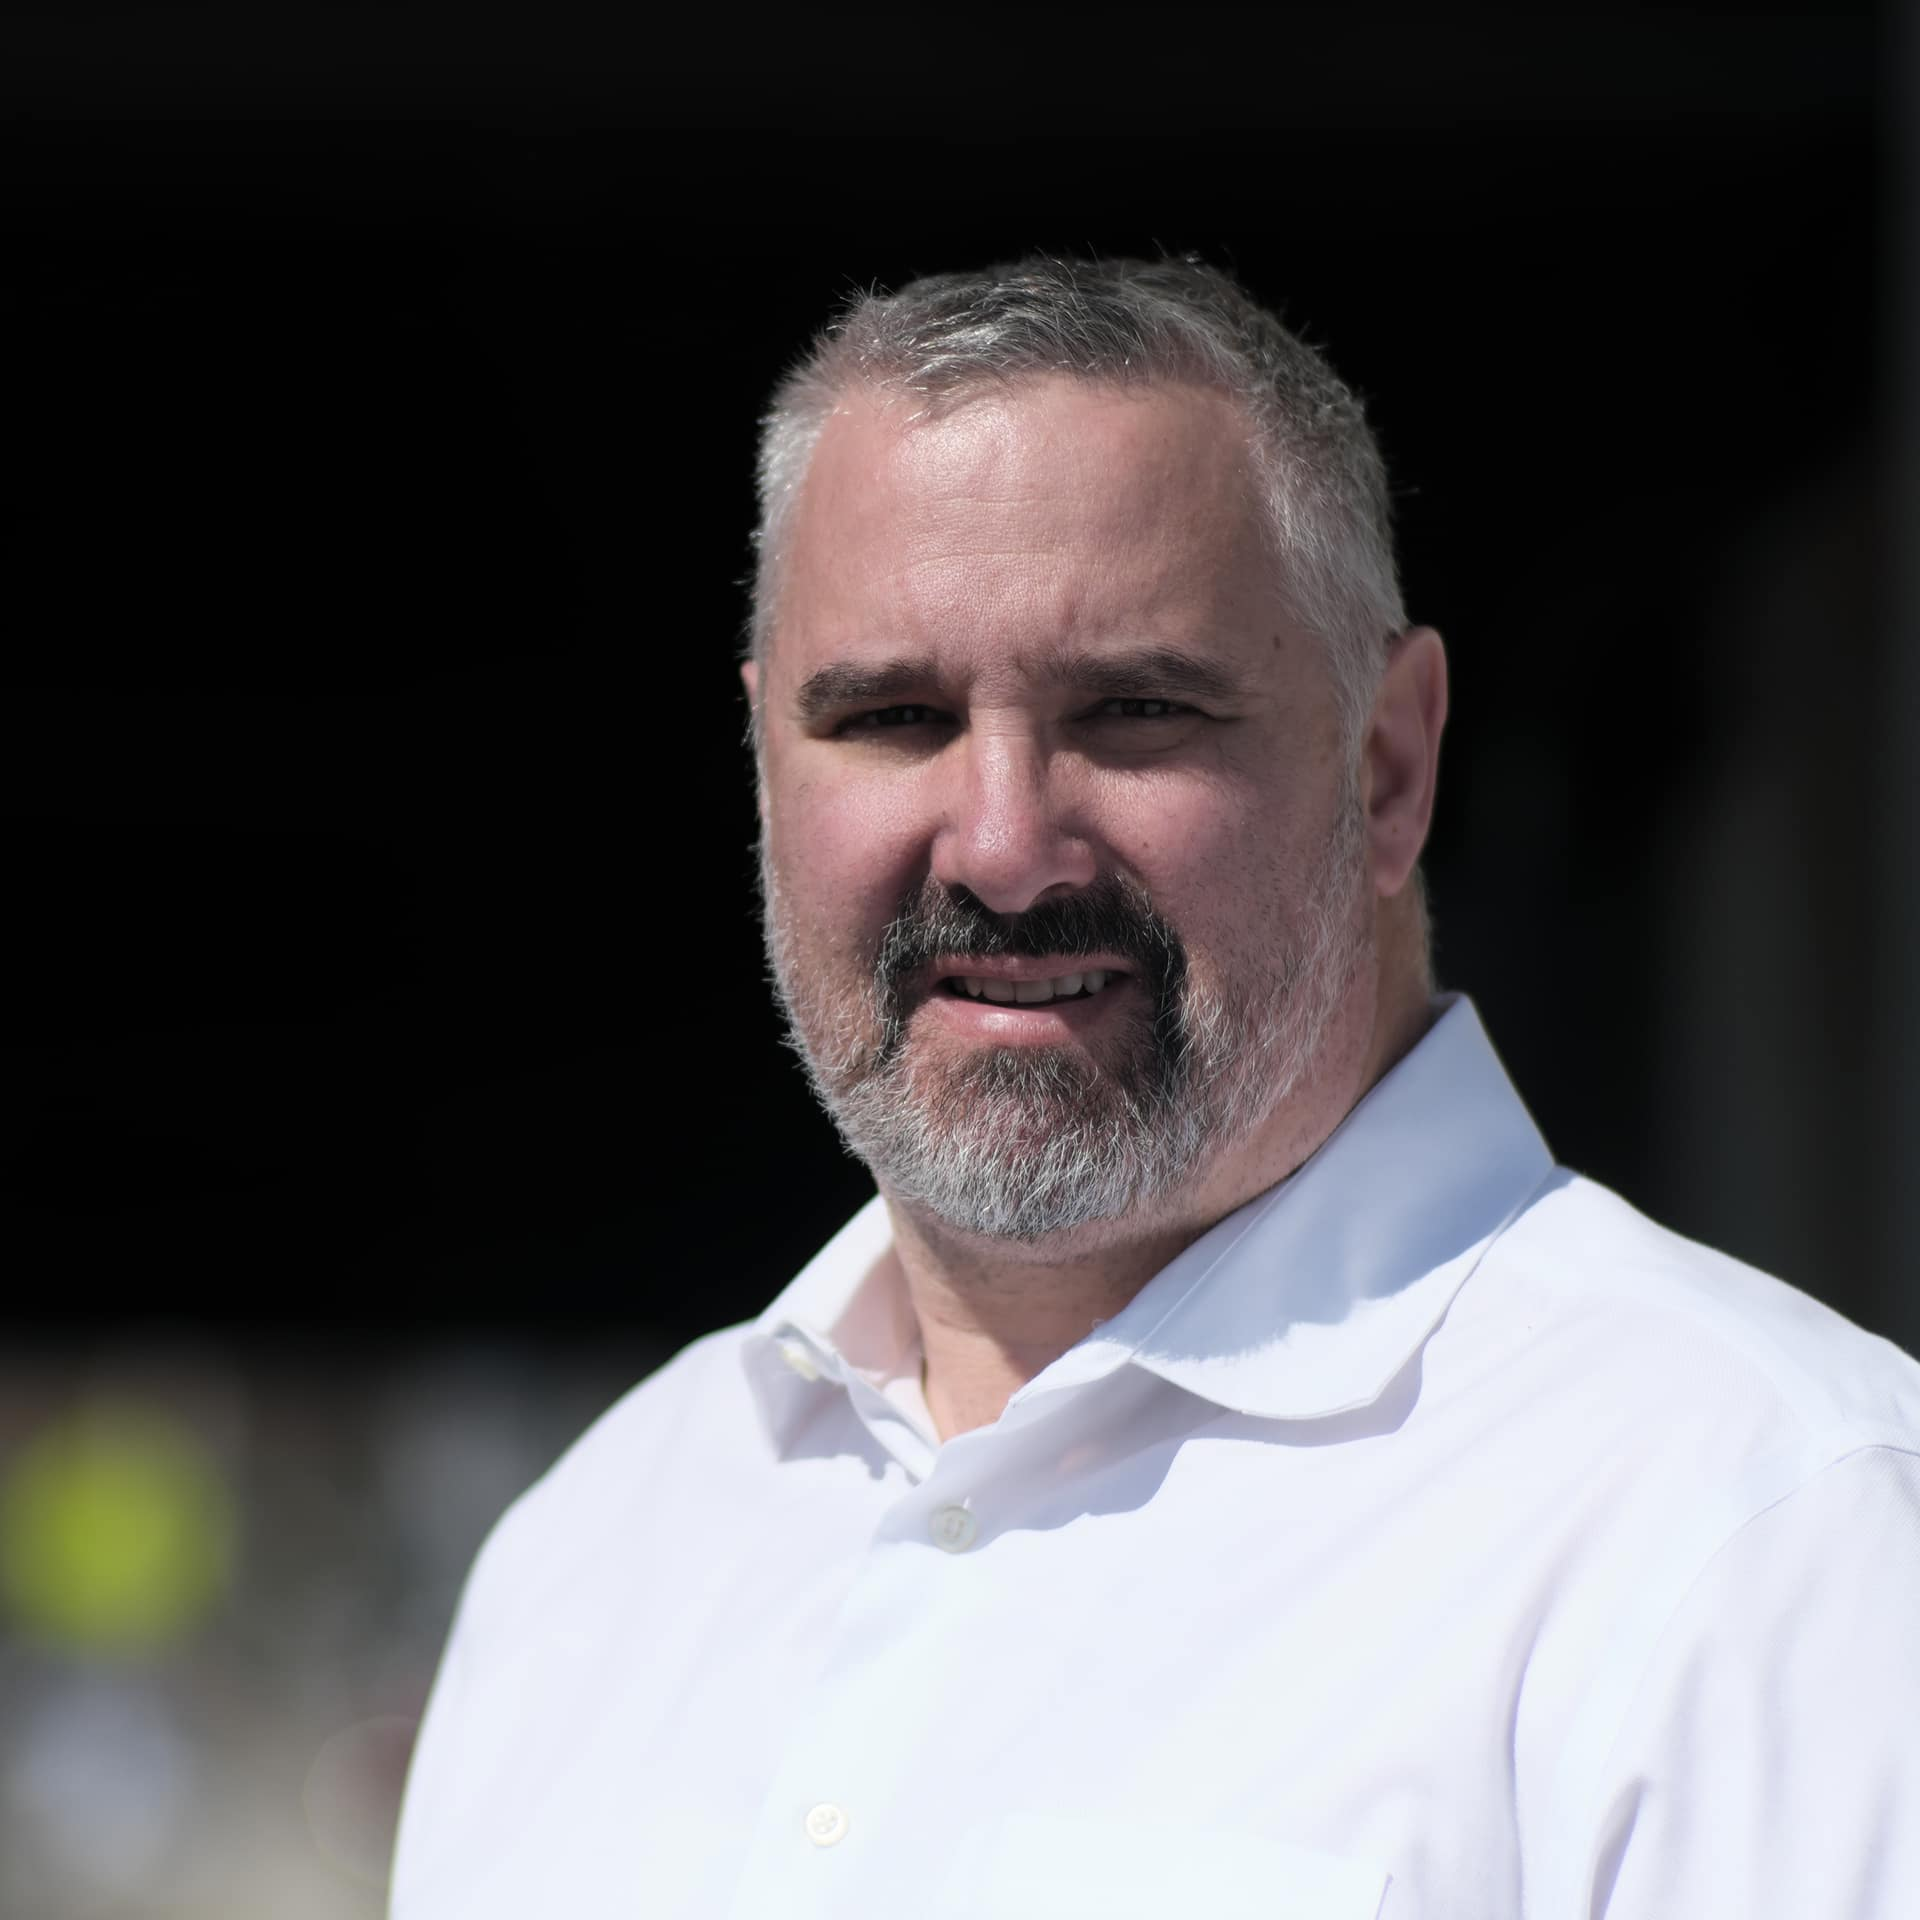 Frank Zabski - Technology Revealed